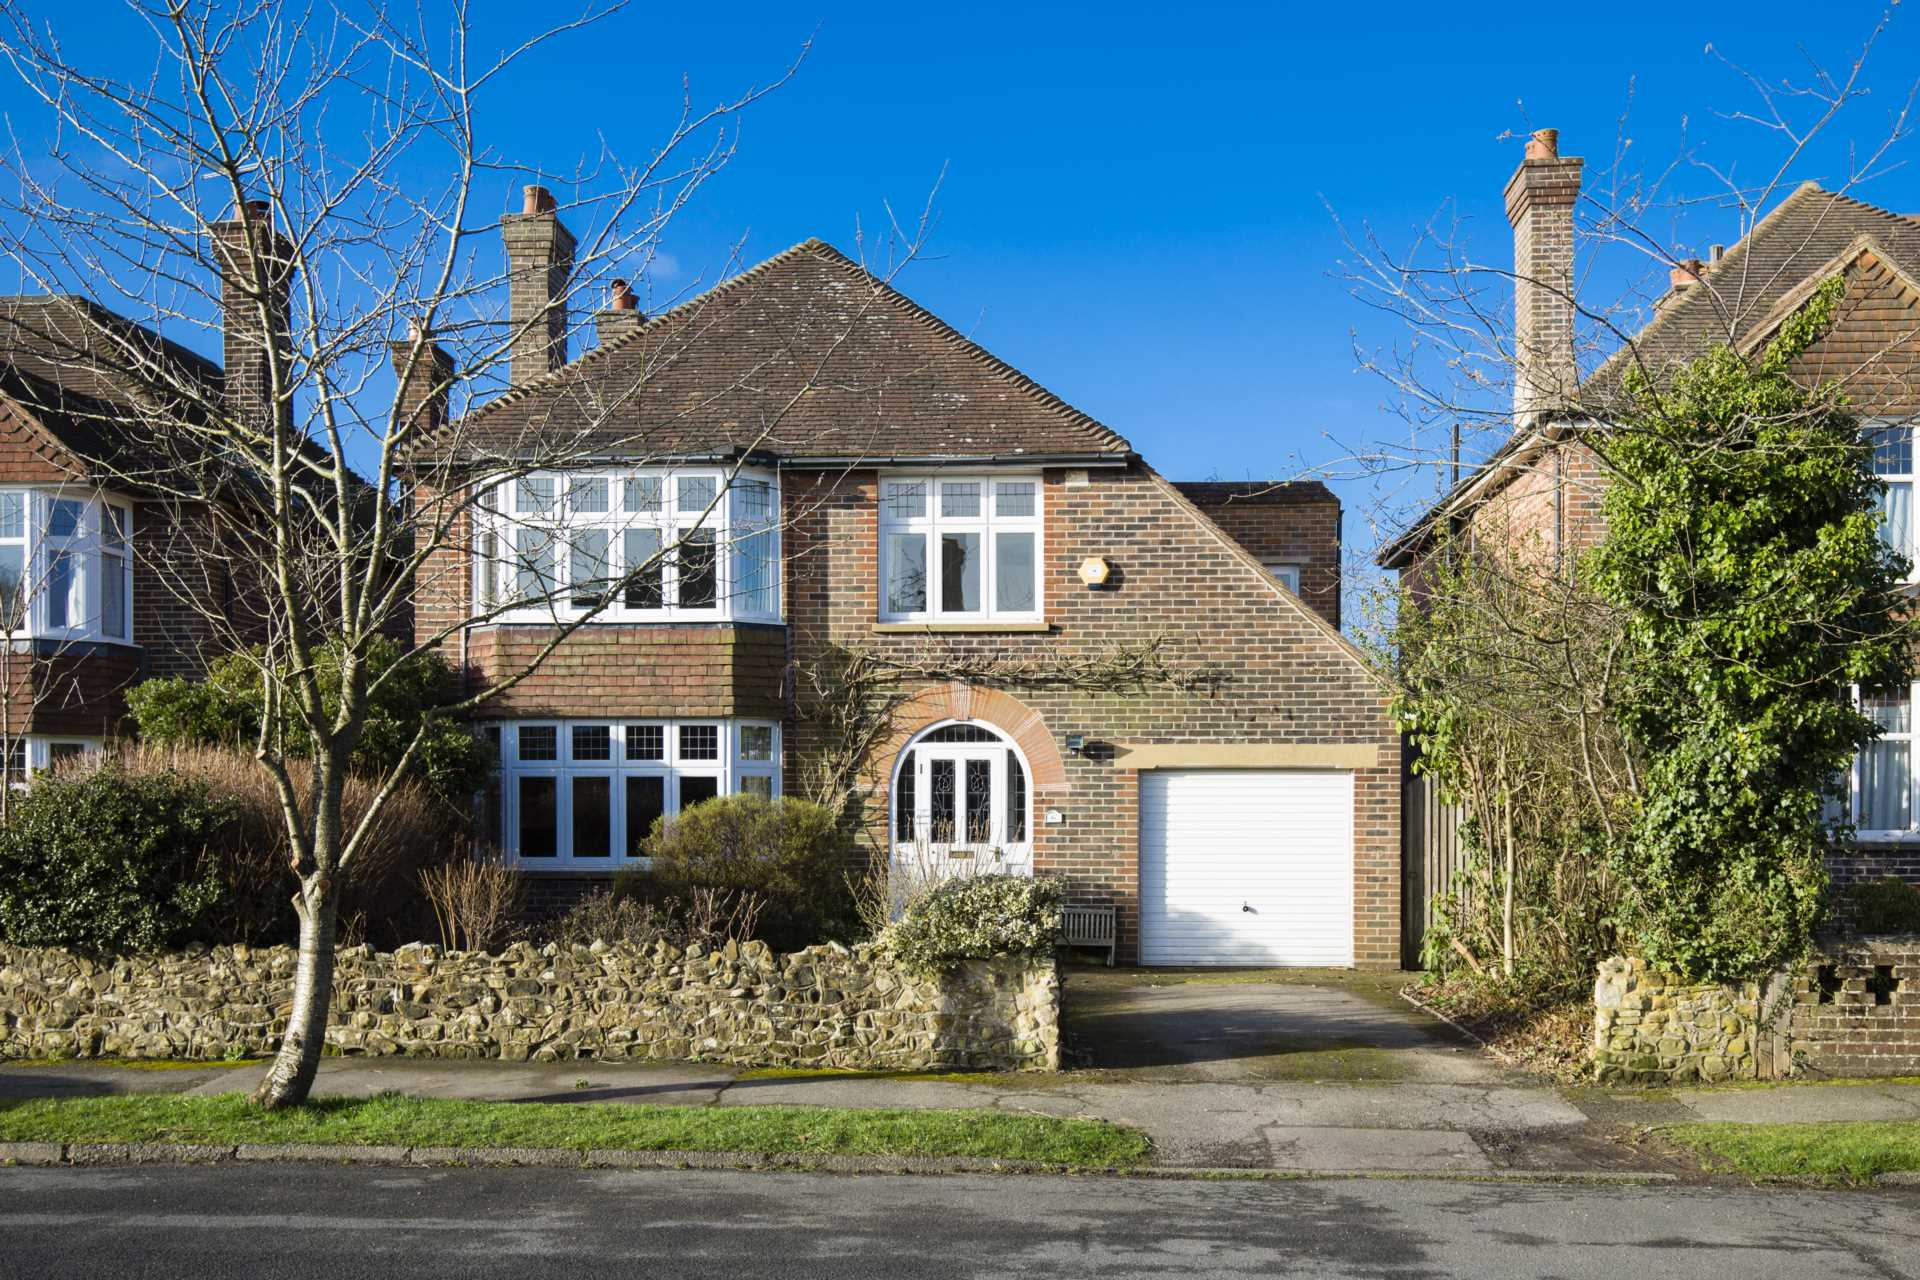 Woodland Way, Bidborough, Image 1